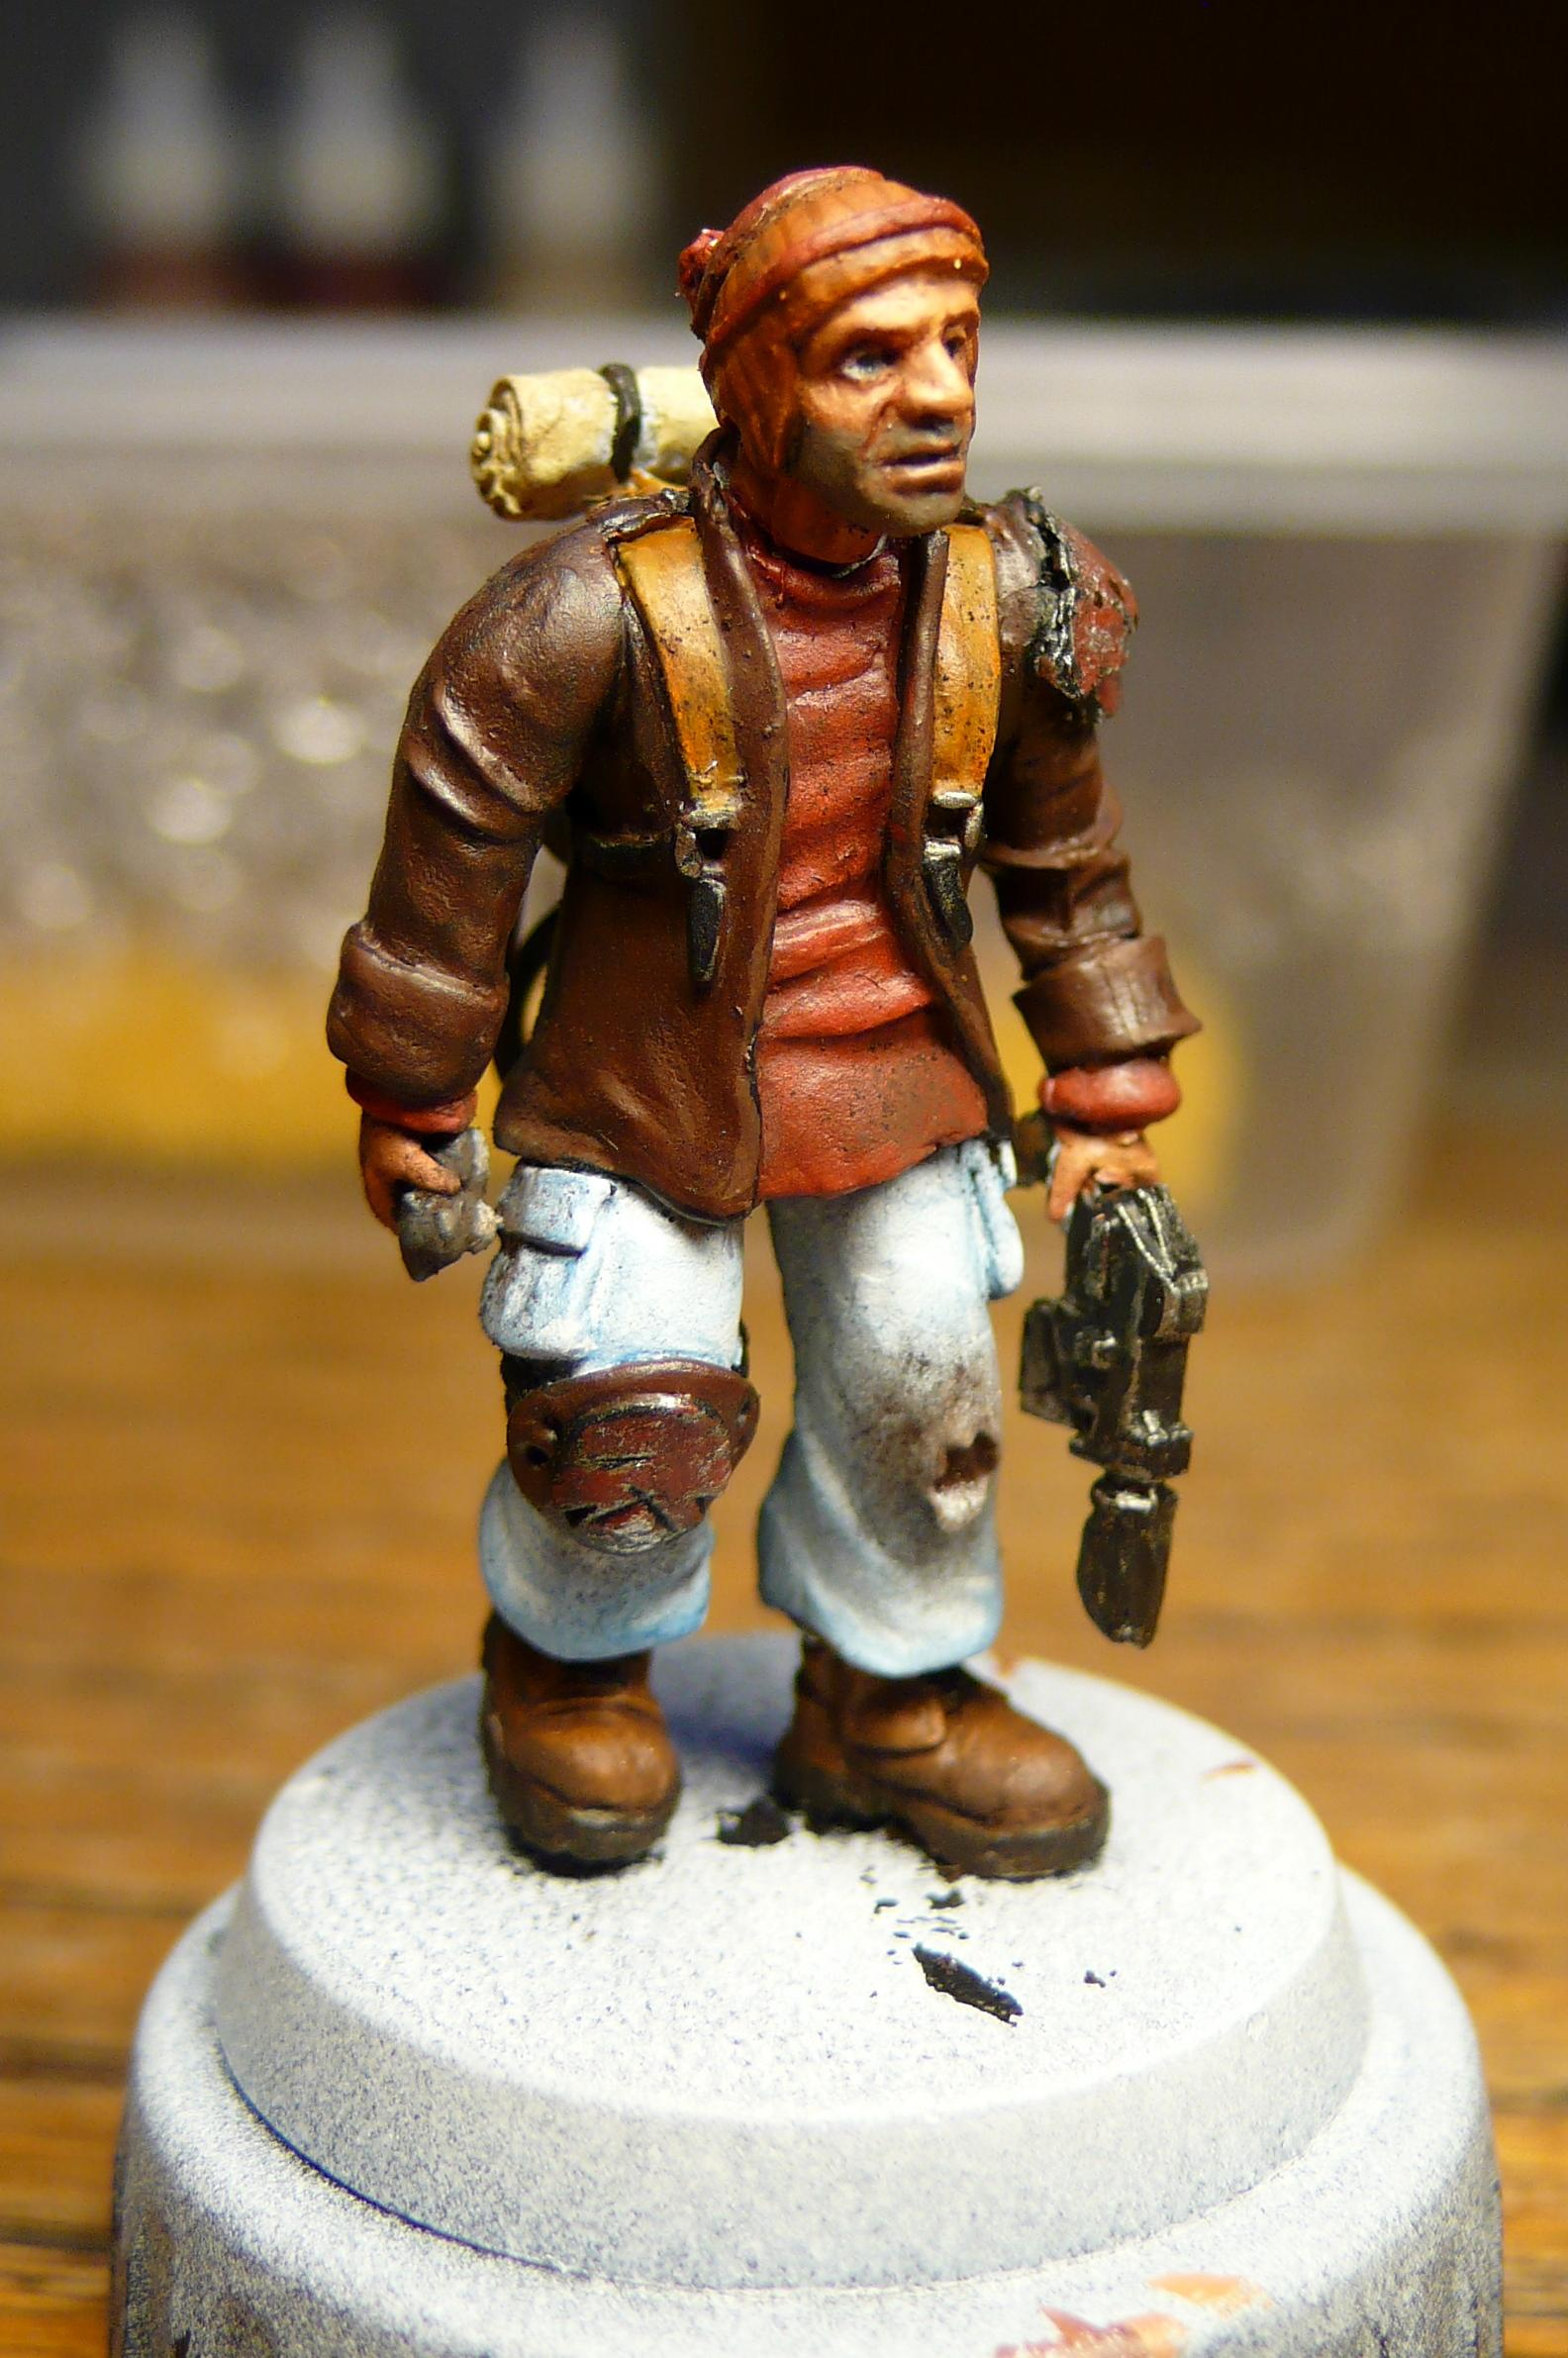 Ash Waste, Civilian, Conversion, Coop, Hat, Necromunda, Pig Iron, Victoria Miniatures, Wooly